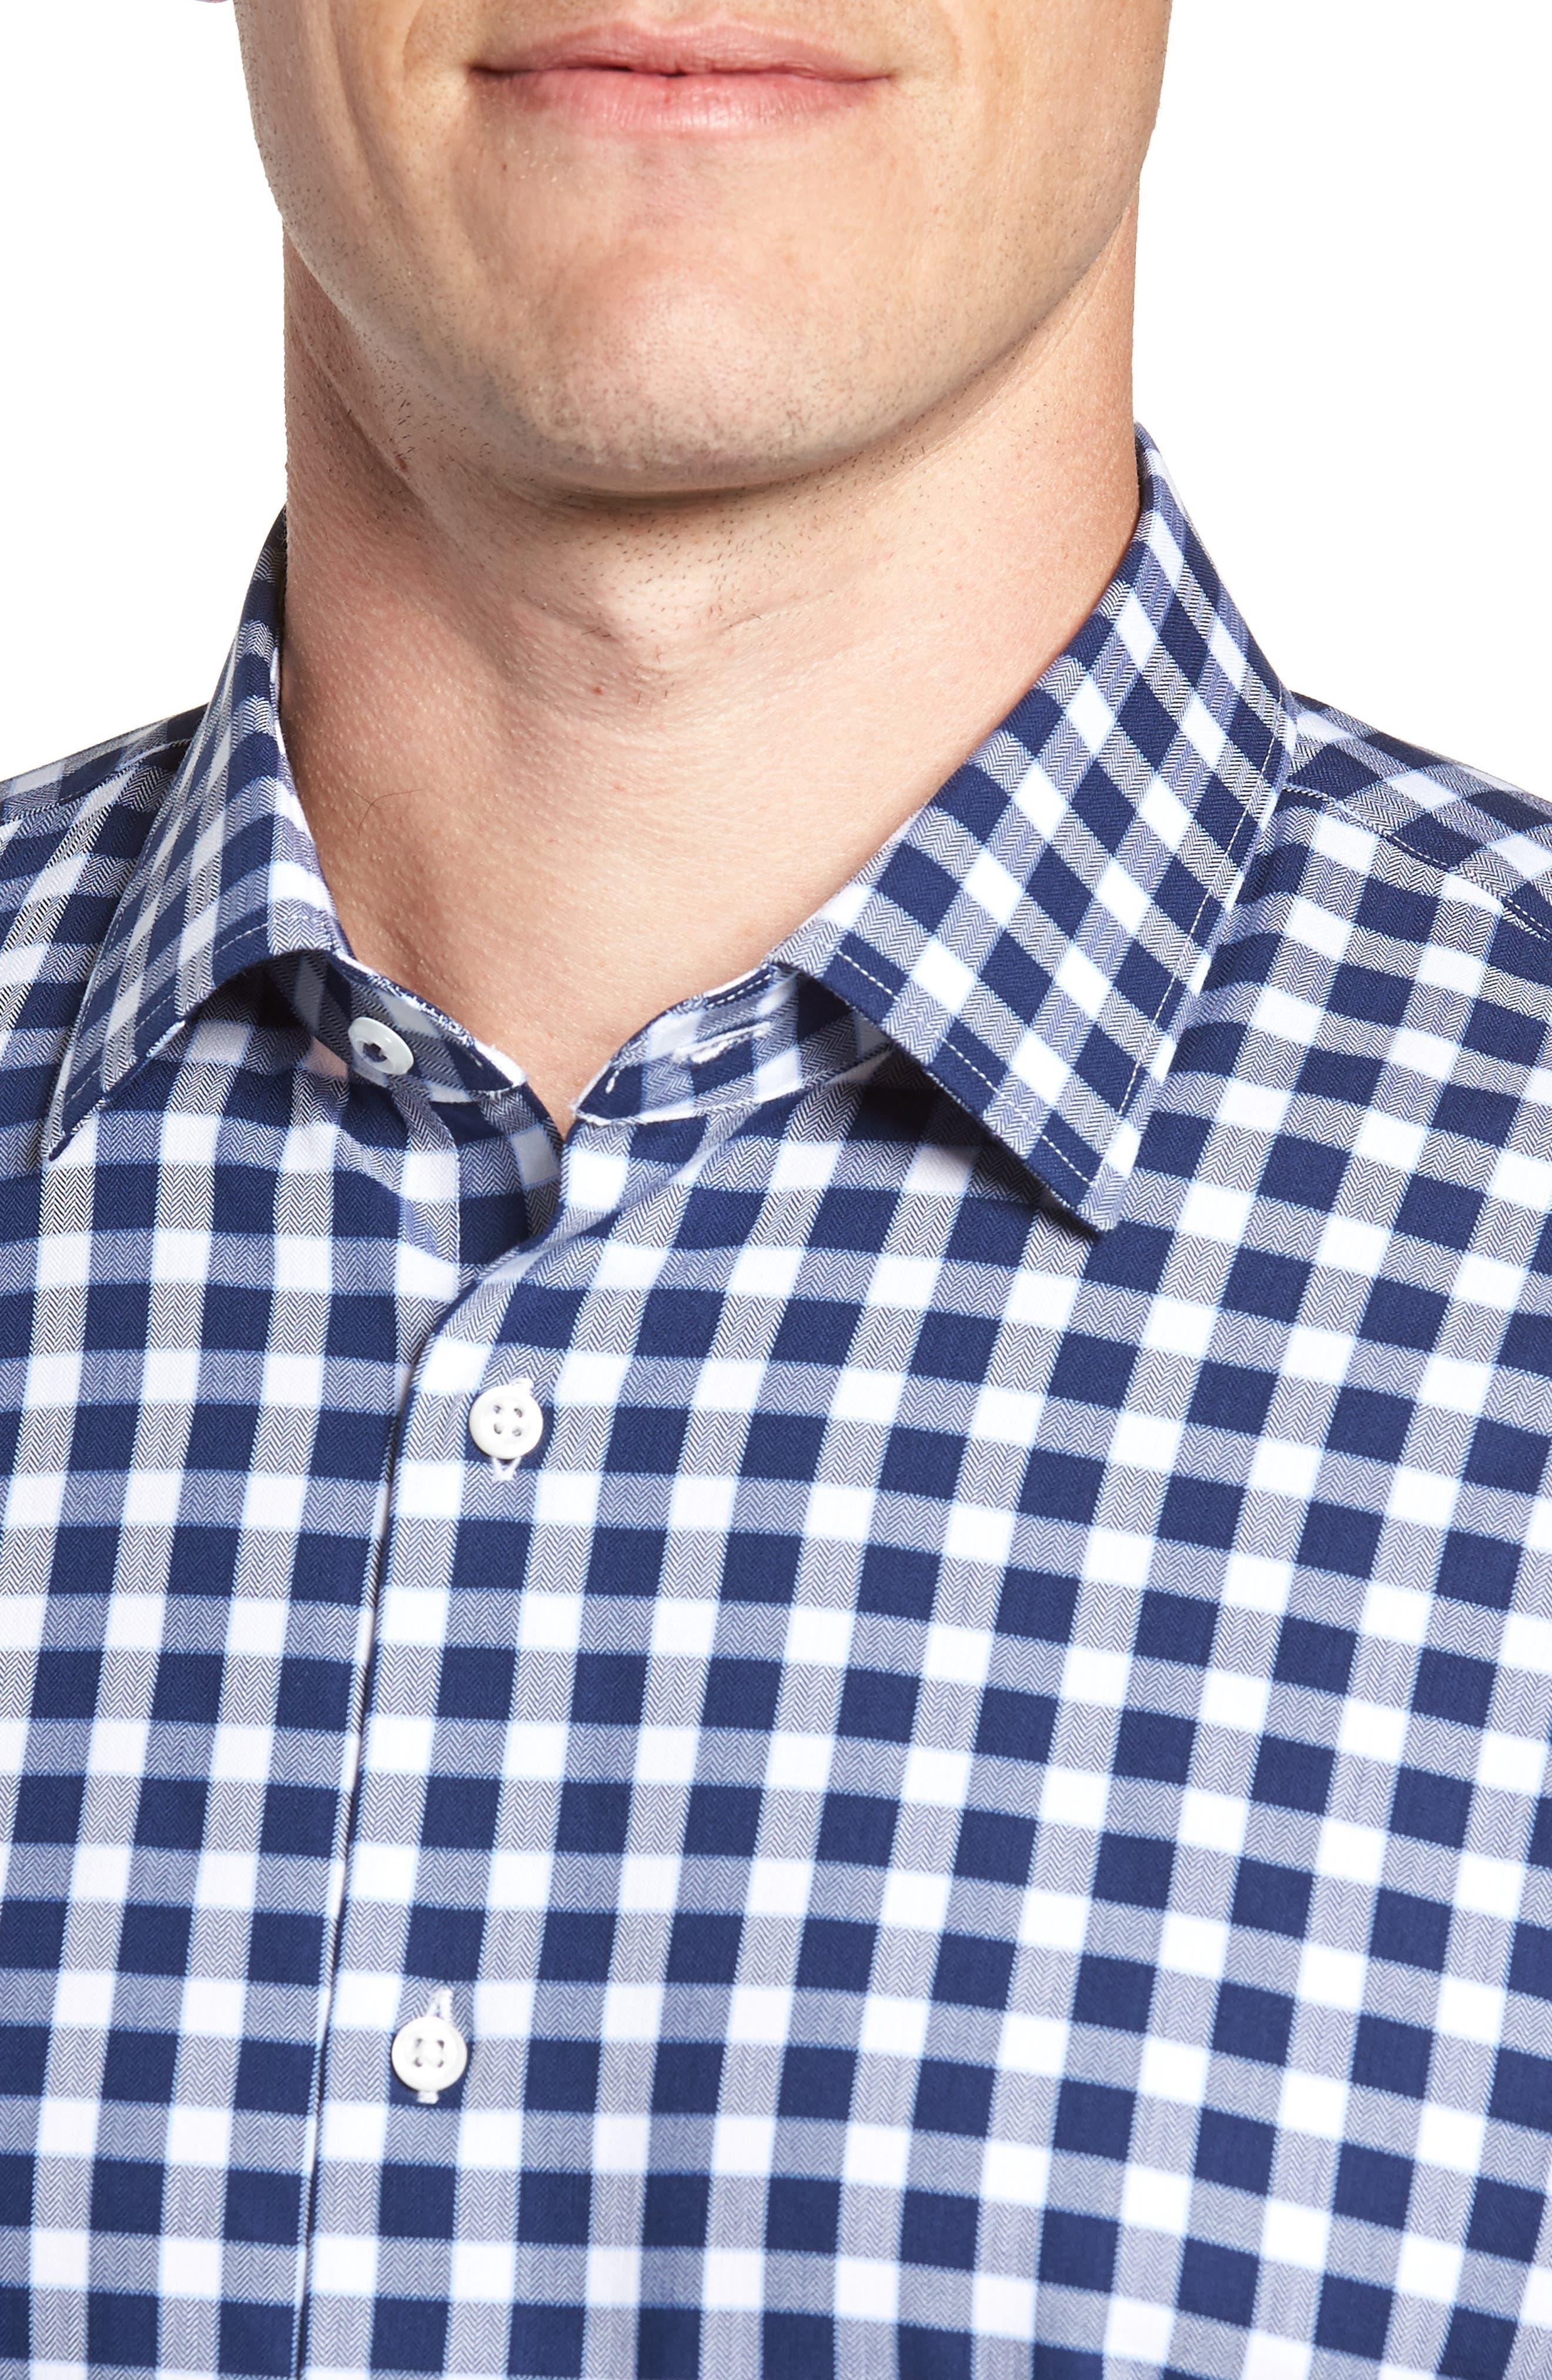 Tech-Smart Trim Fit Stretch Check Dress Shirt,                             Alternate thumbnail 2, color,                             NAVY PEACOAT